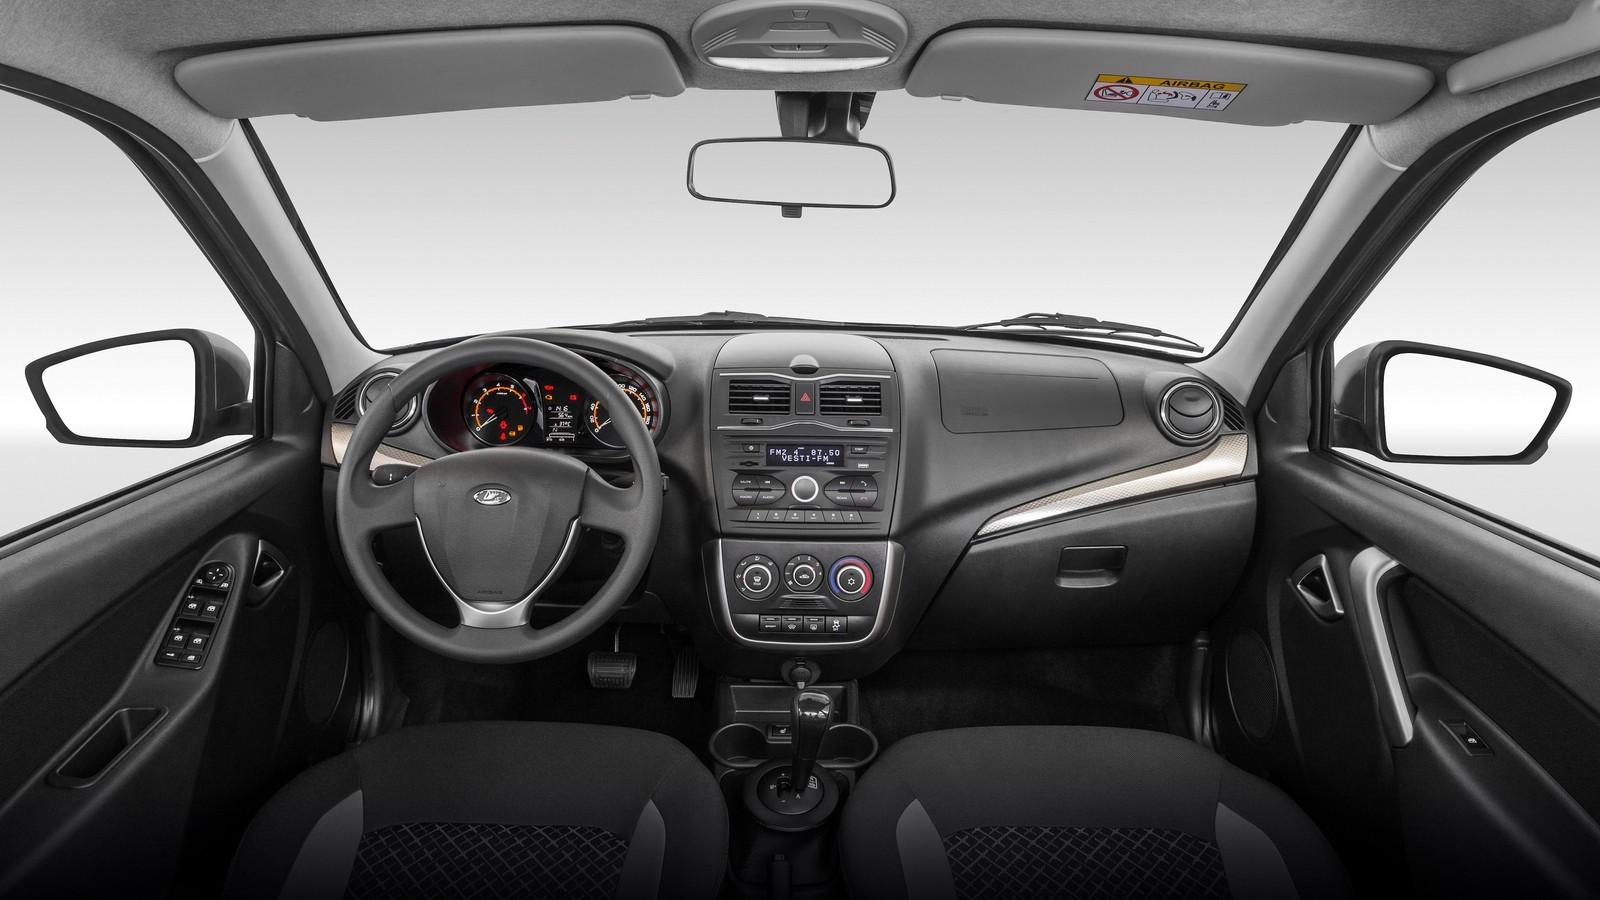 01 new lada granta interior - Тест драйв лада гранта 2018 года лифтбек